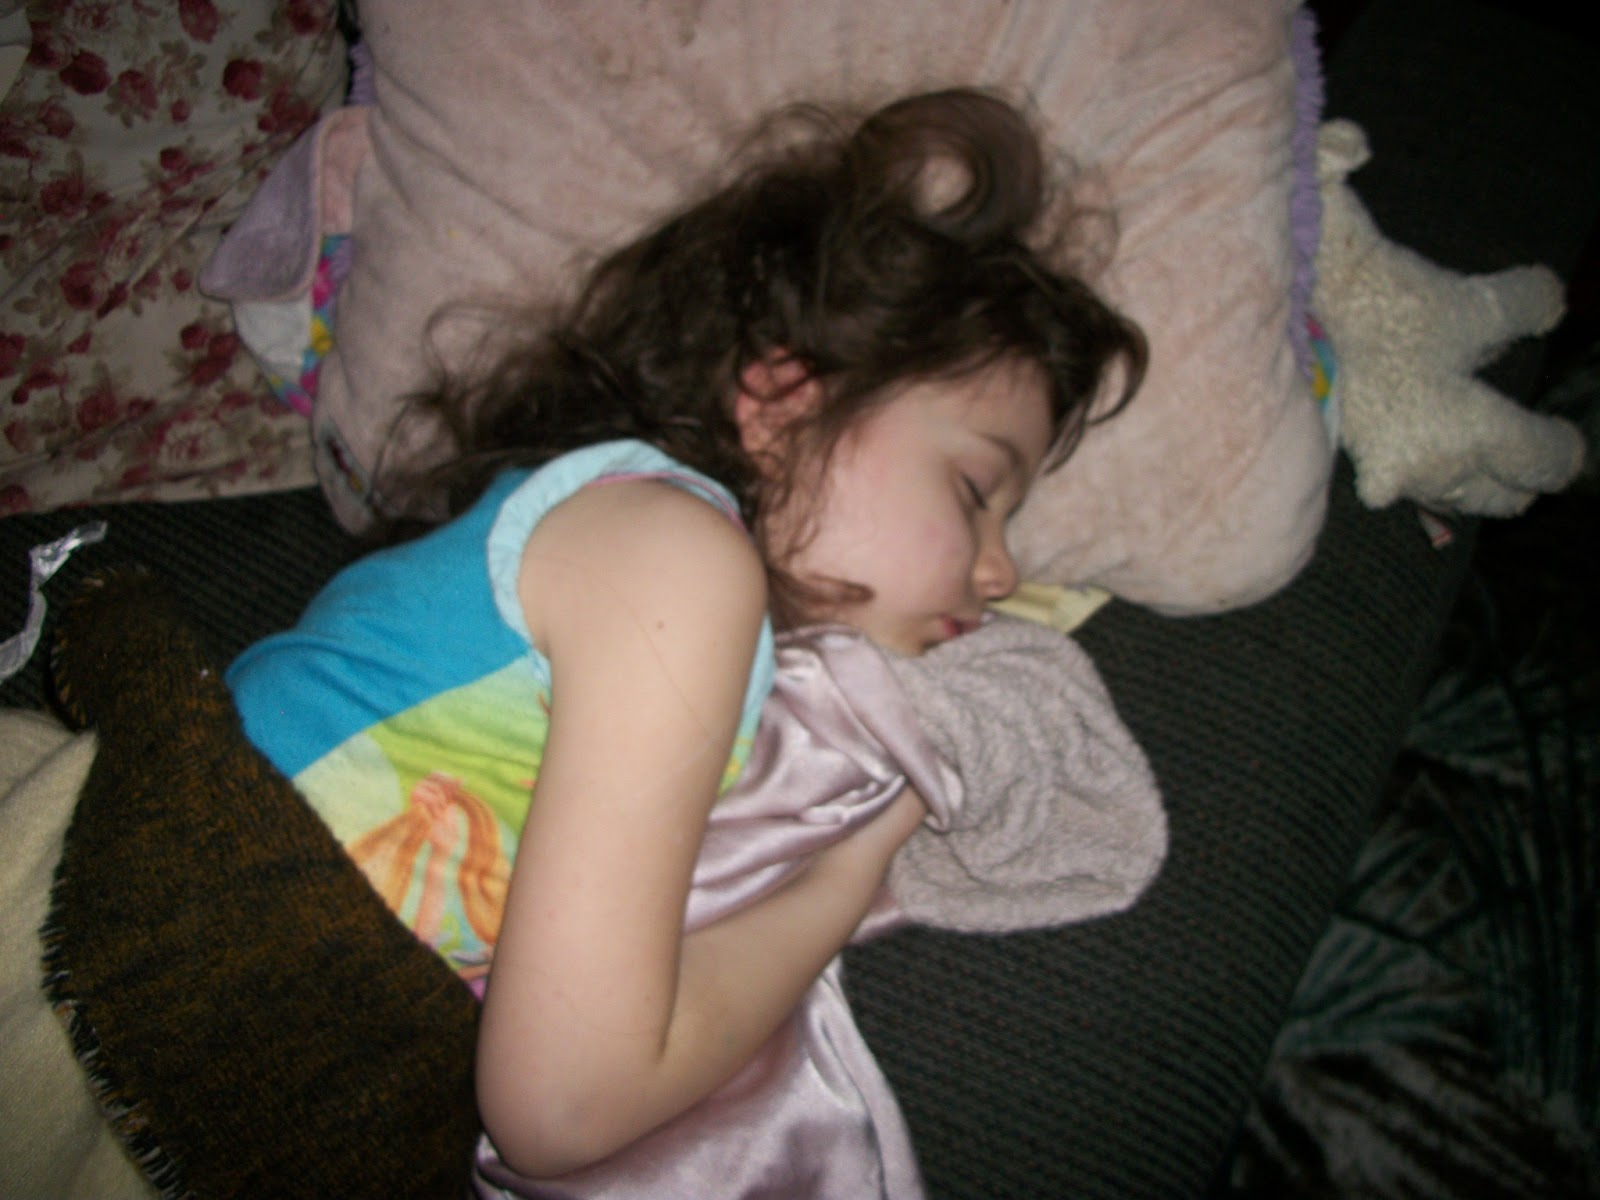 my sister sleeps nude